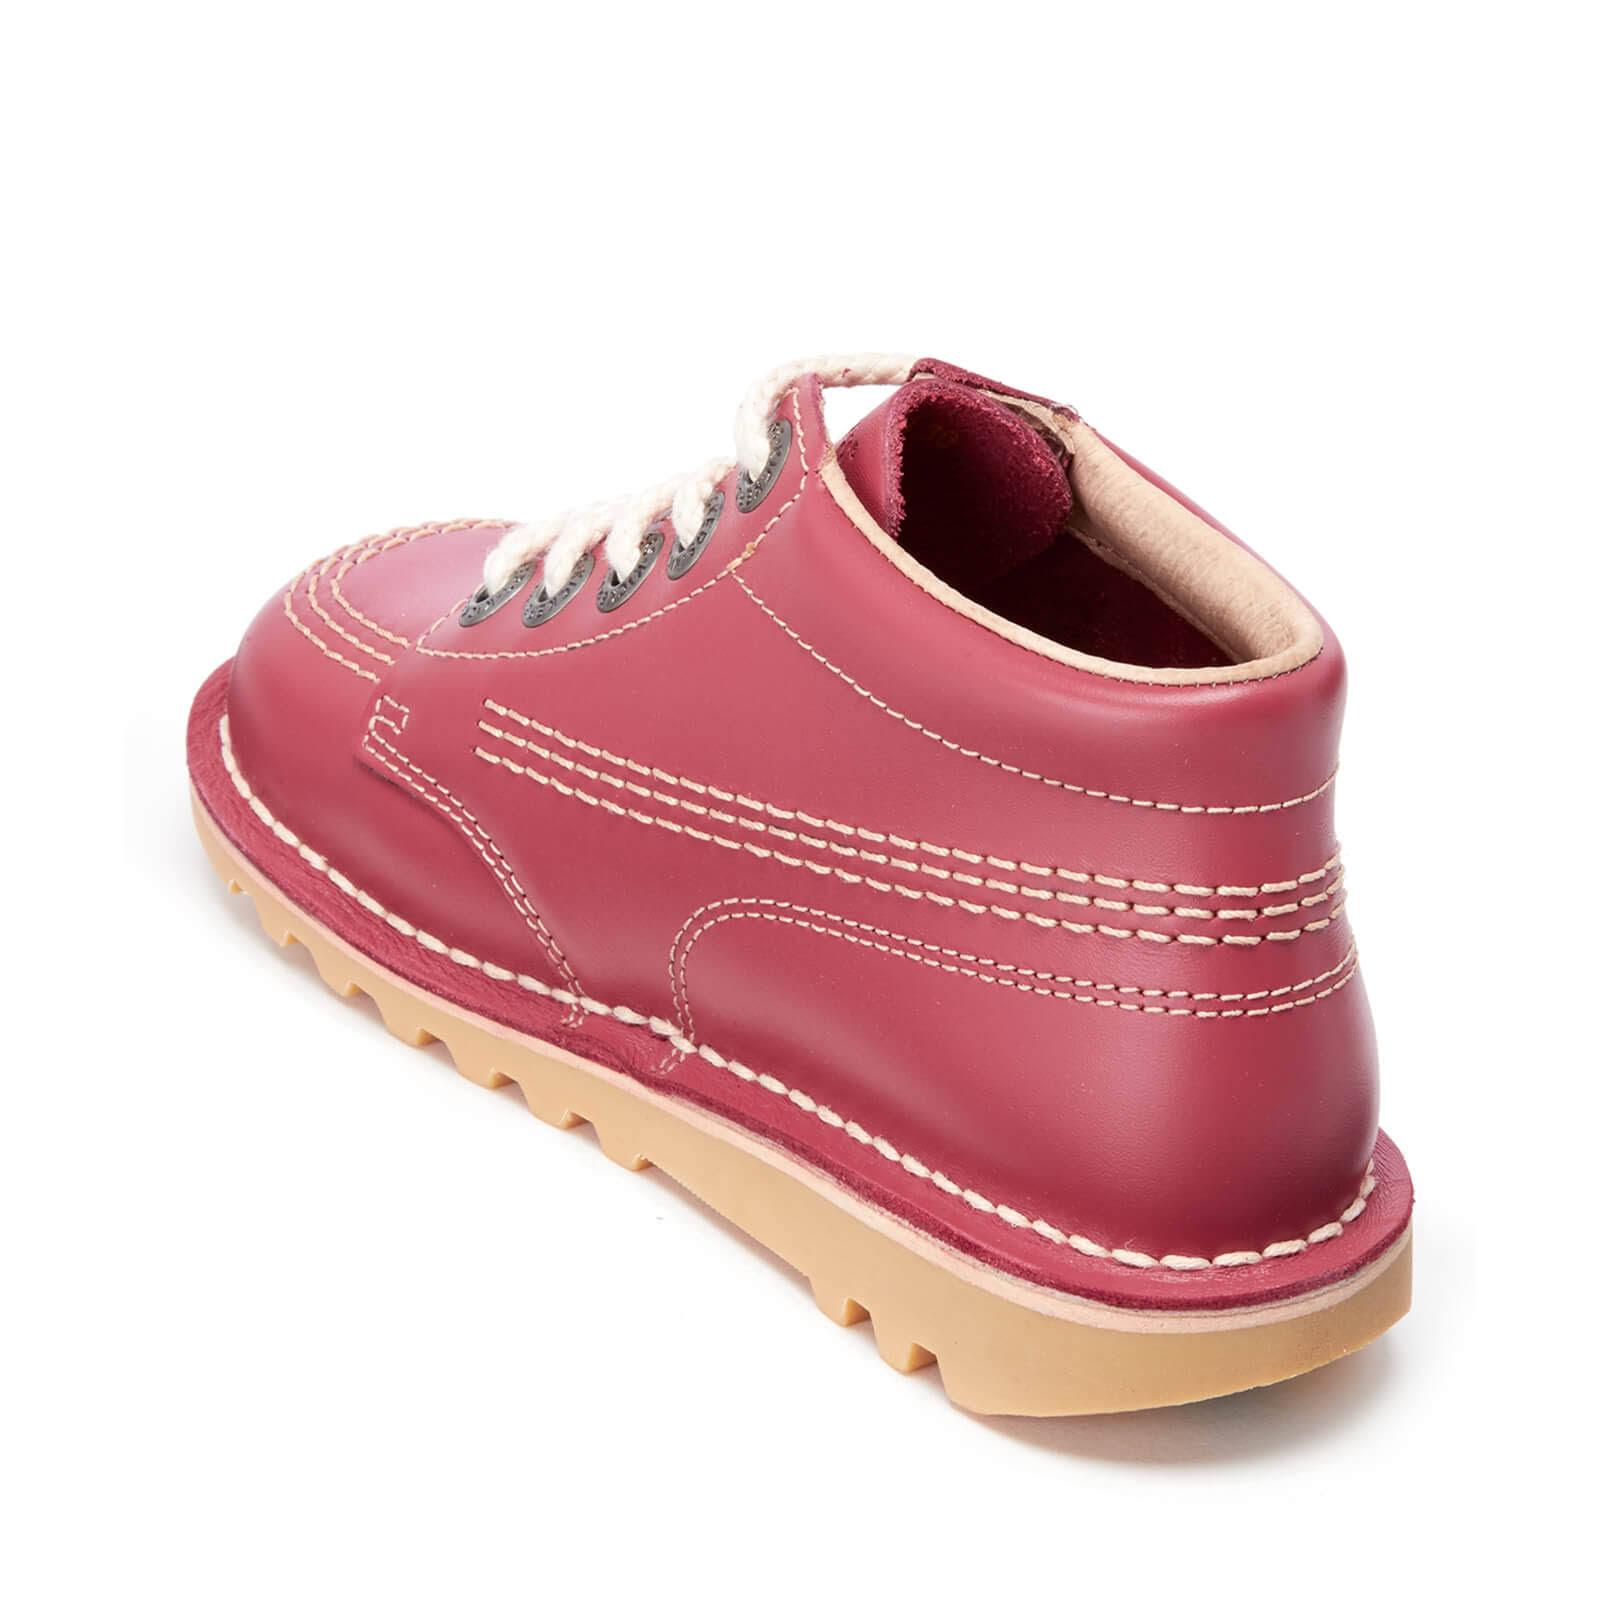 Vk Infanteu Kickers Hi BootsBlossom Kids 8 Pink 25 'Kick HbYE9IWDe2